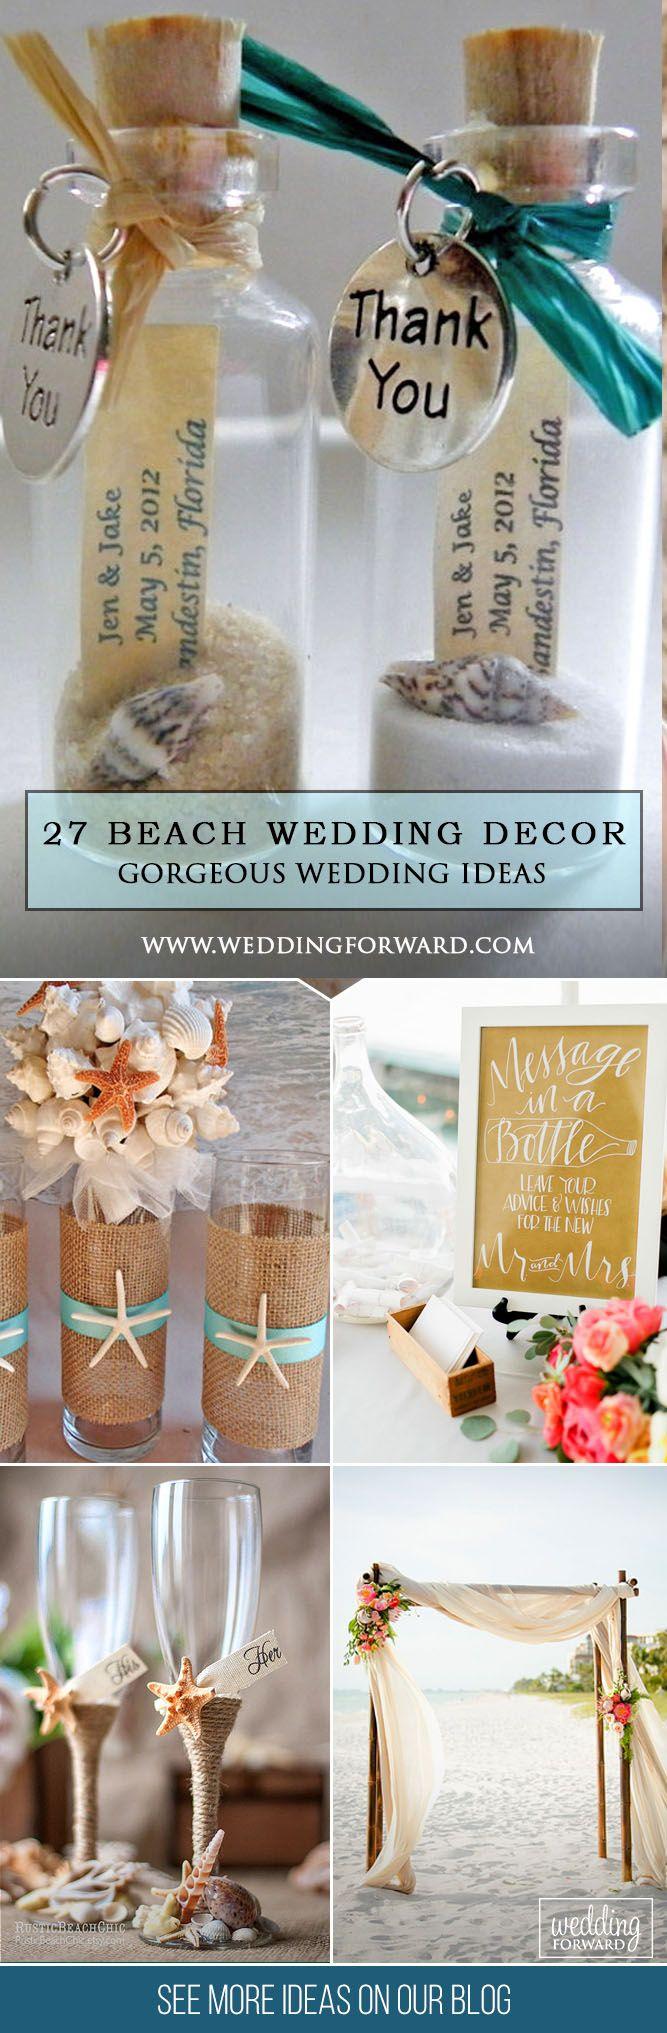 bef13f211815 27 Gorgeous Beach Wedding Decoration Ideas .